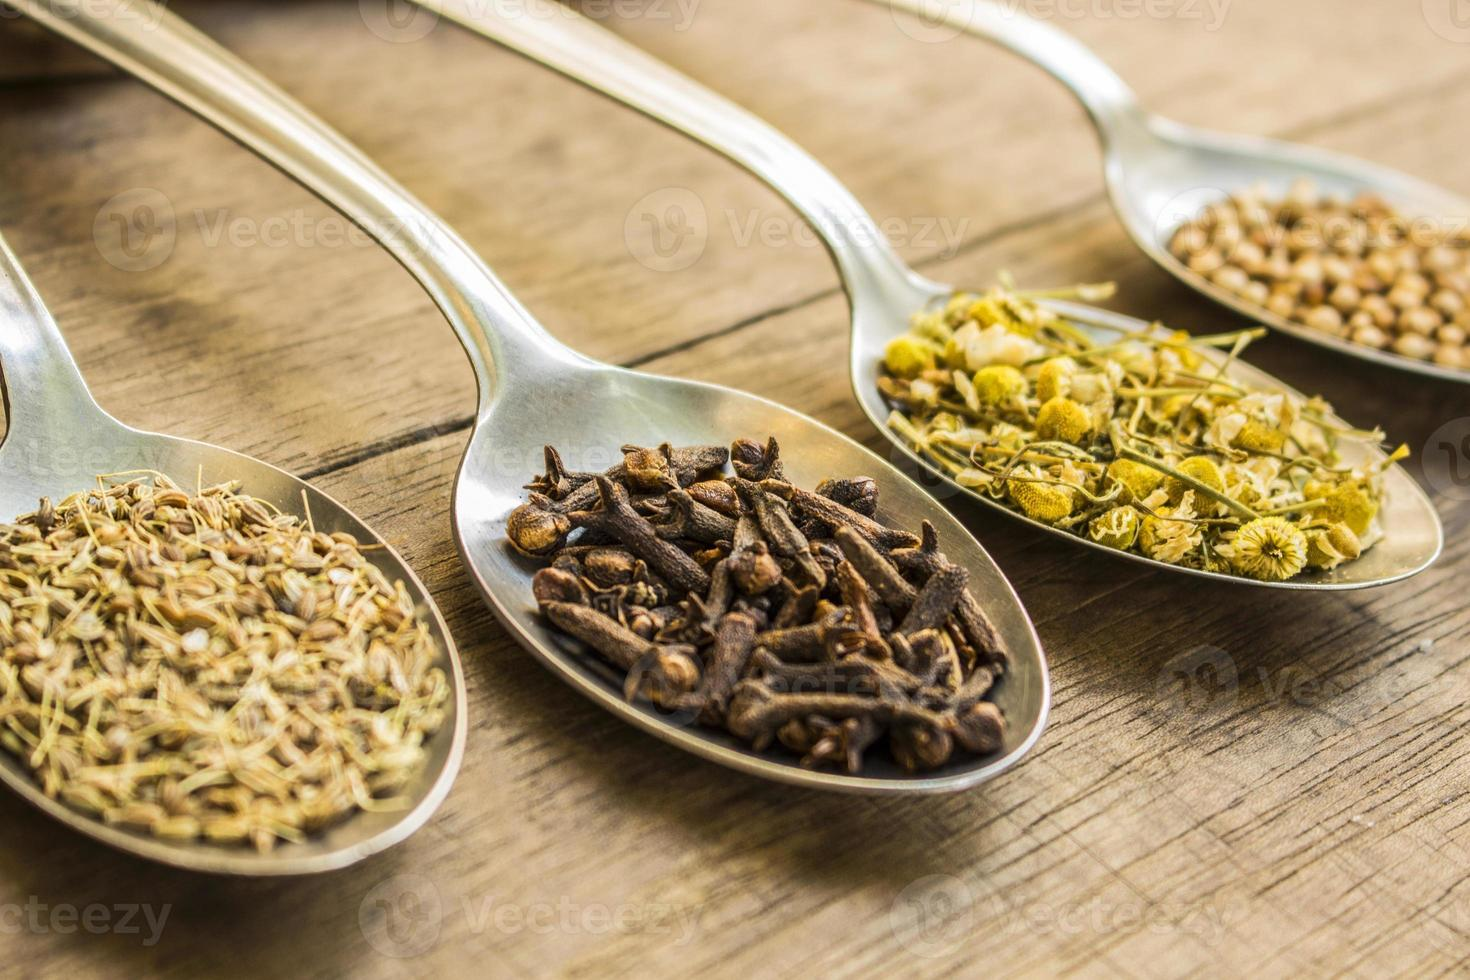 kruidnagel, kamille en andere kruidenthee-ingrediënten foto